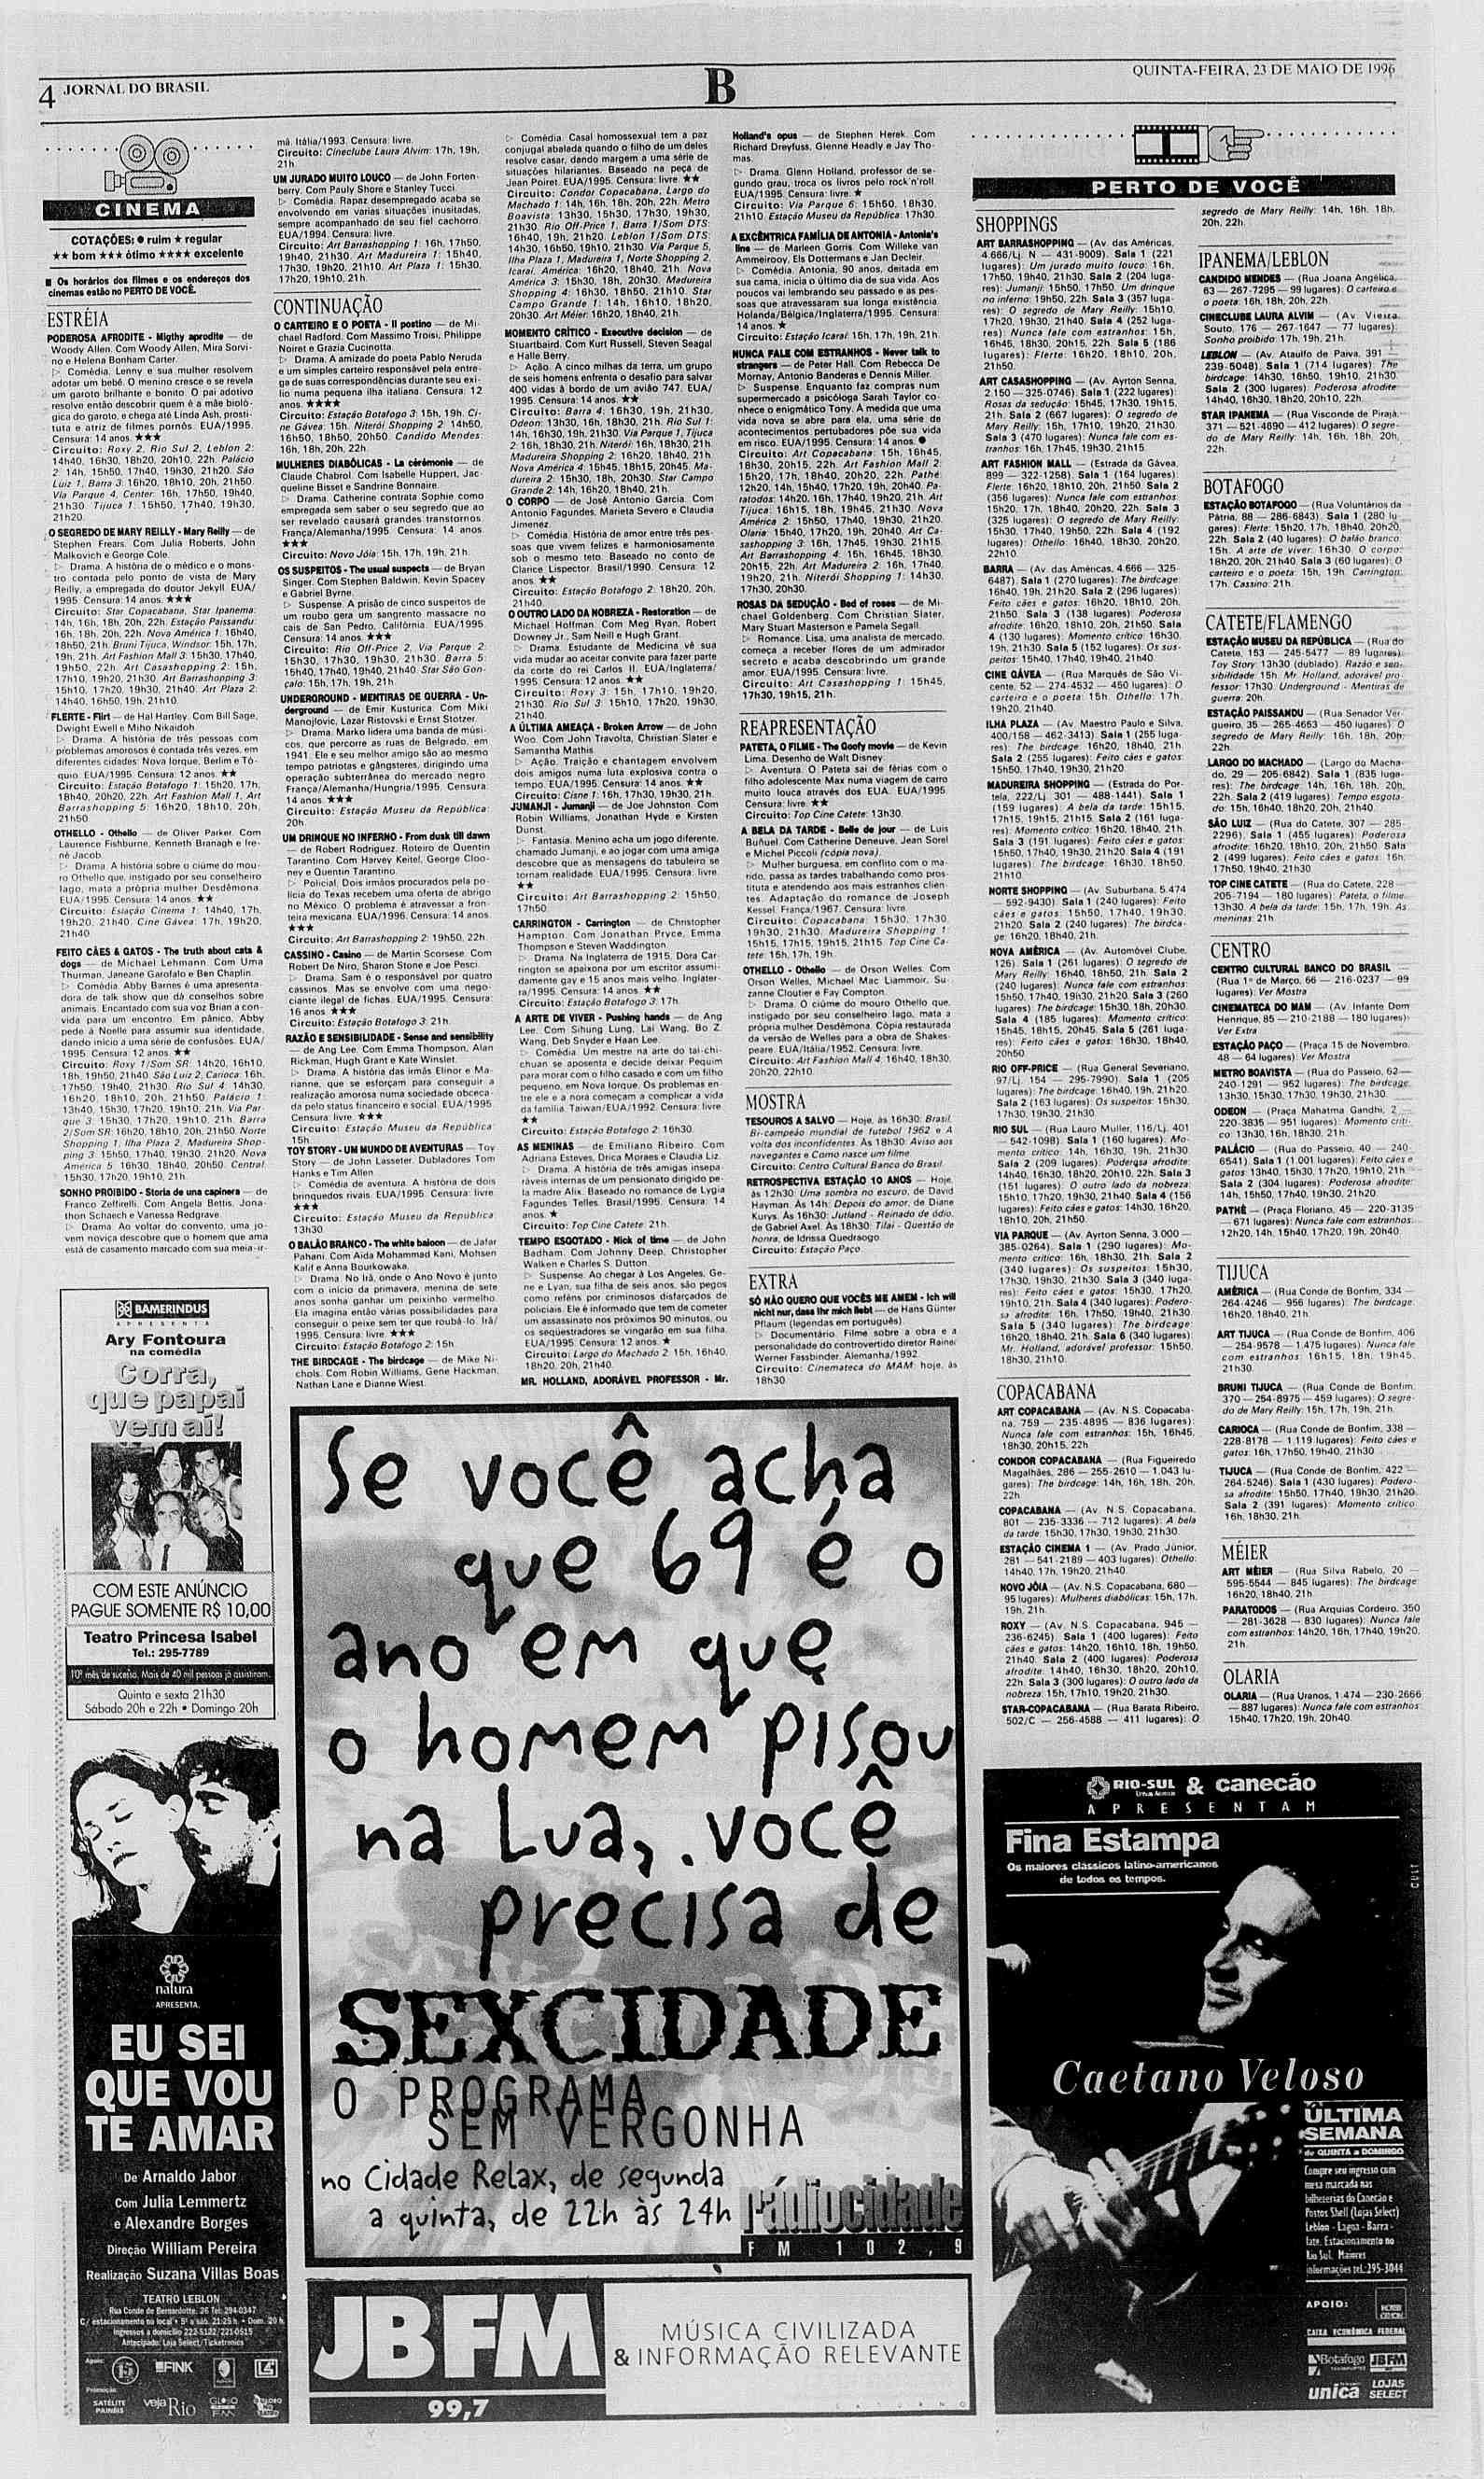 Braslia Brasilia Arnildo Schulz i W$M Bird diz que Discurso do presidente Saºde gasta PDF